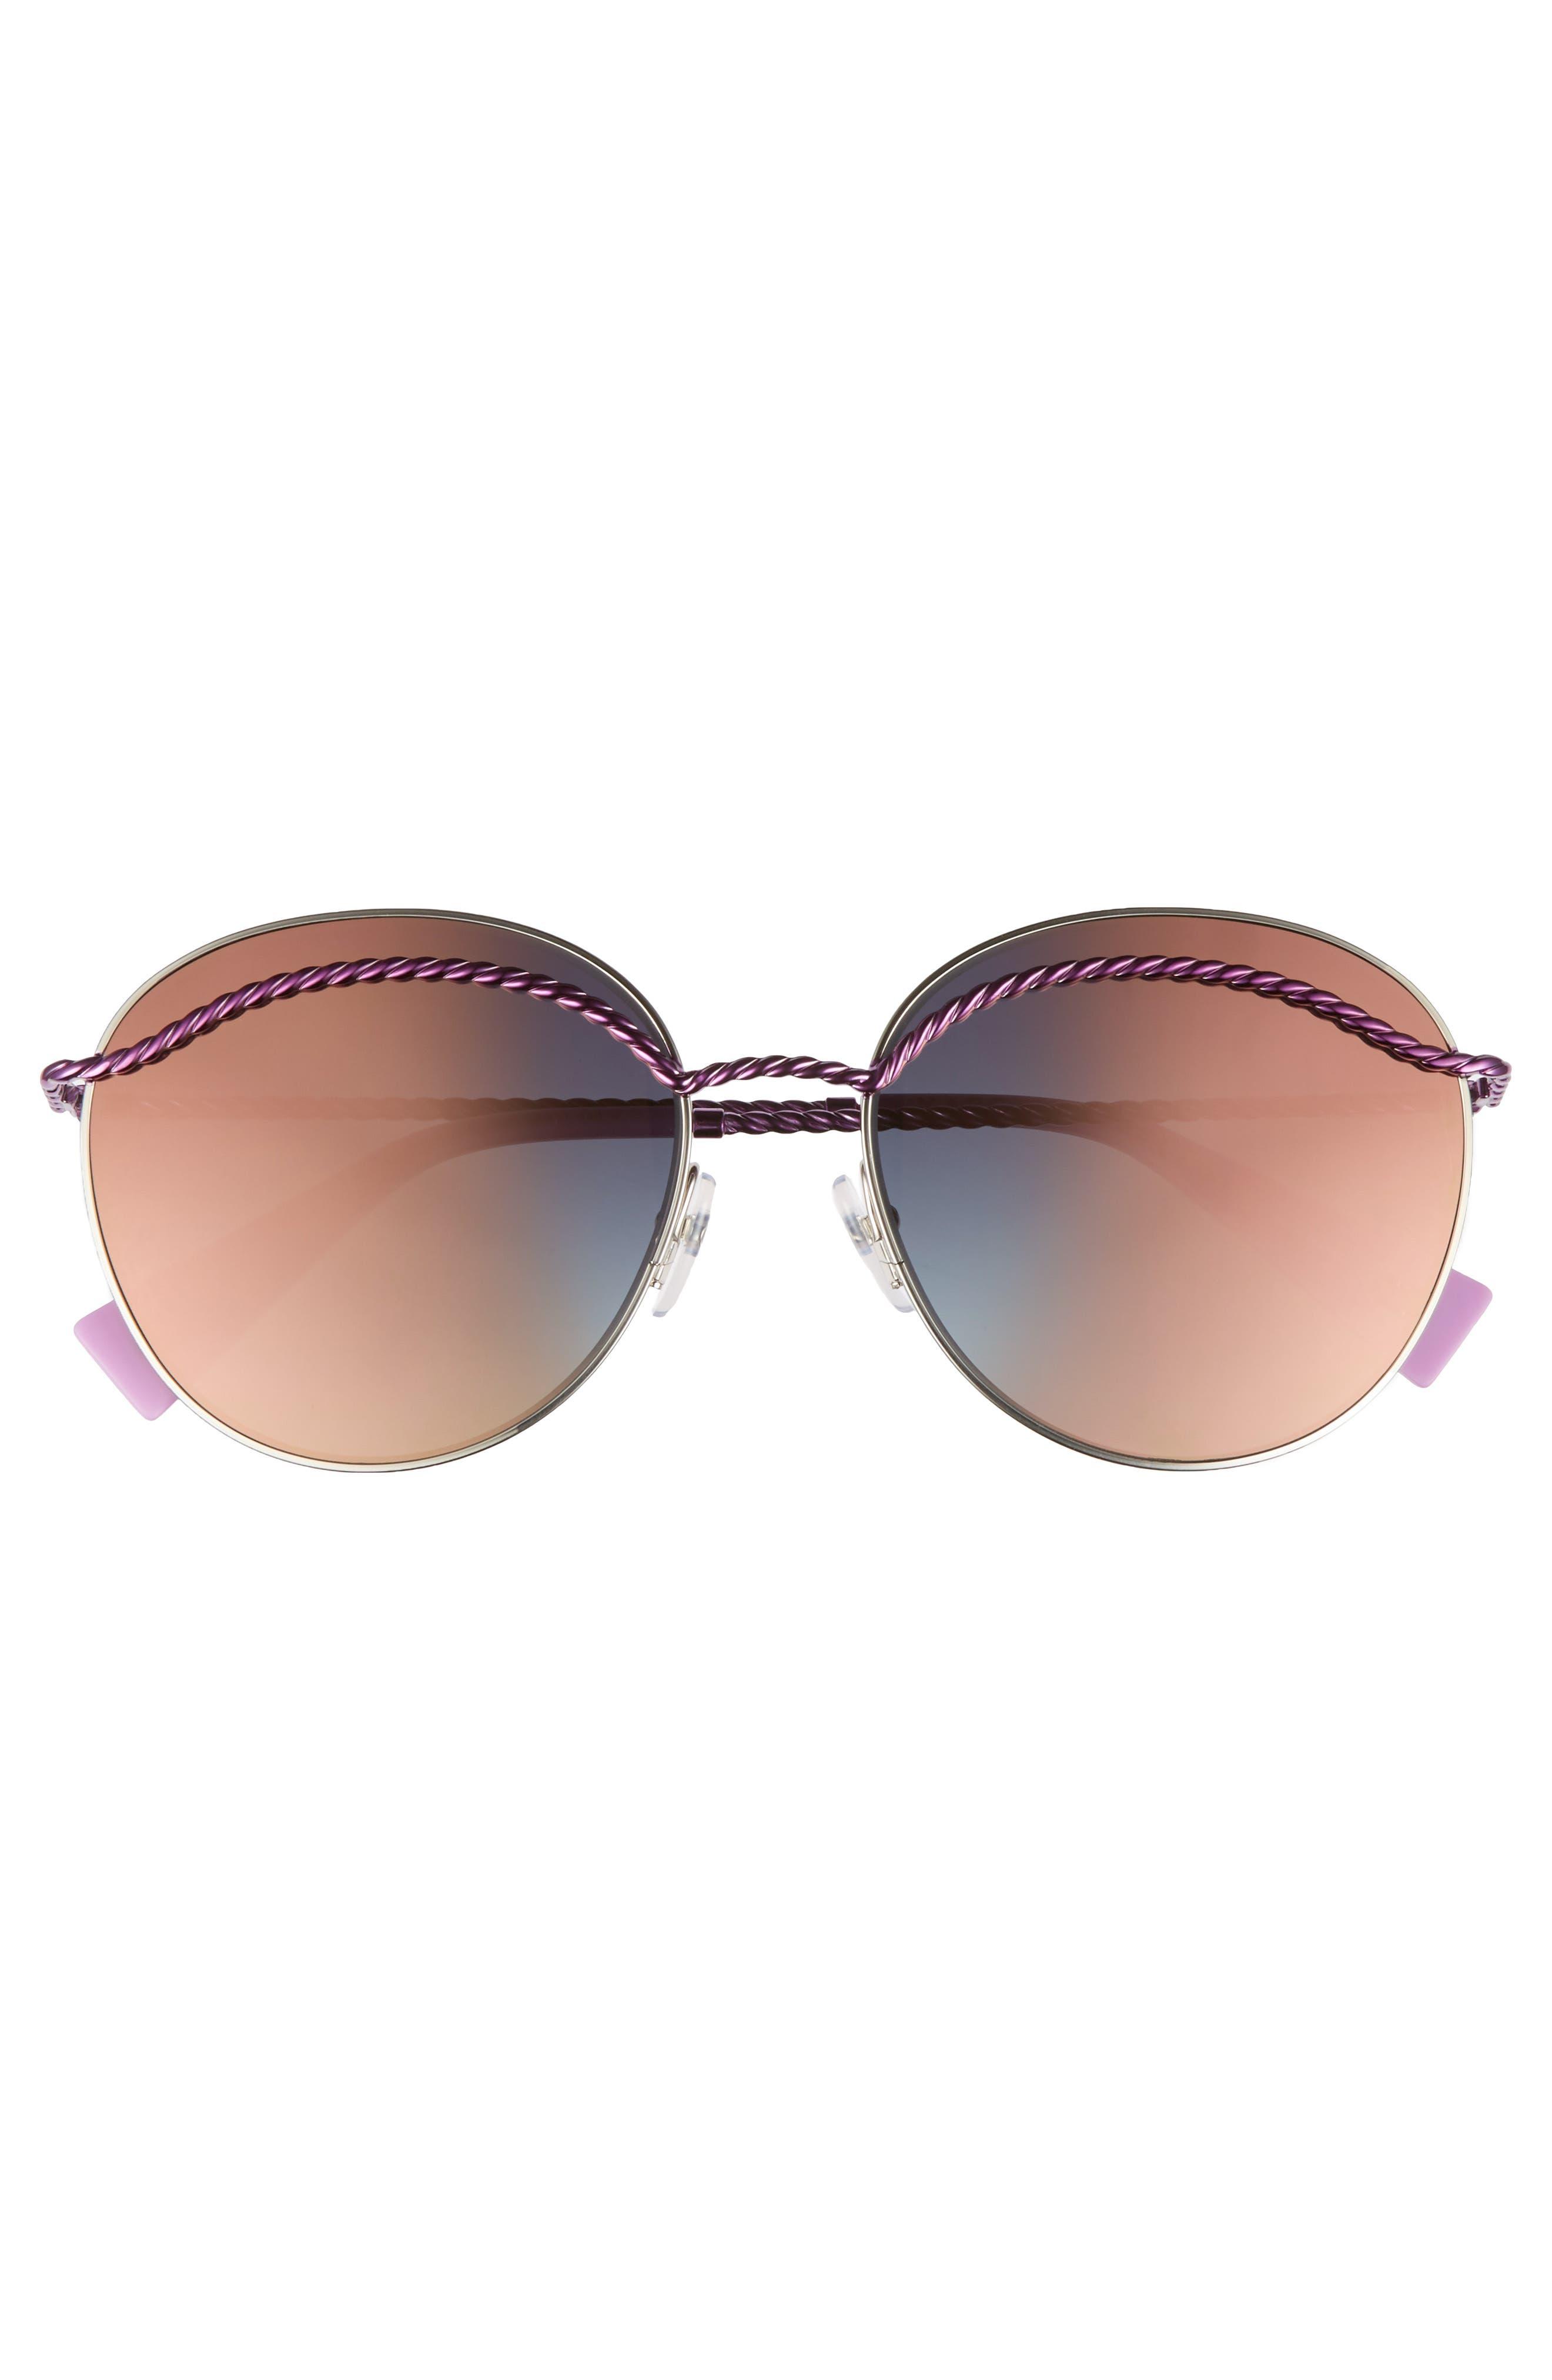 58mm Round Sunglasses,                             Alternate thumbnail 3, color,                             MATTE MAGENTA